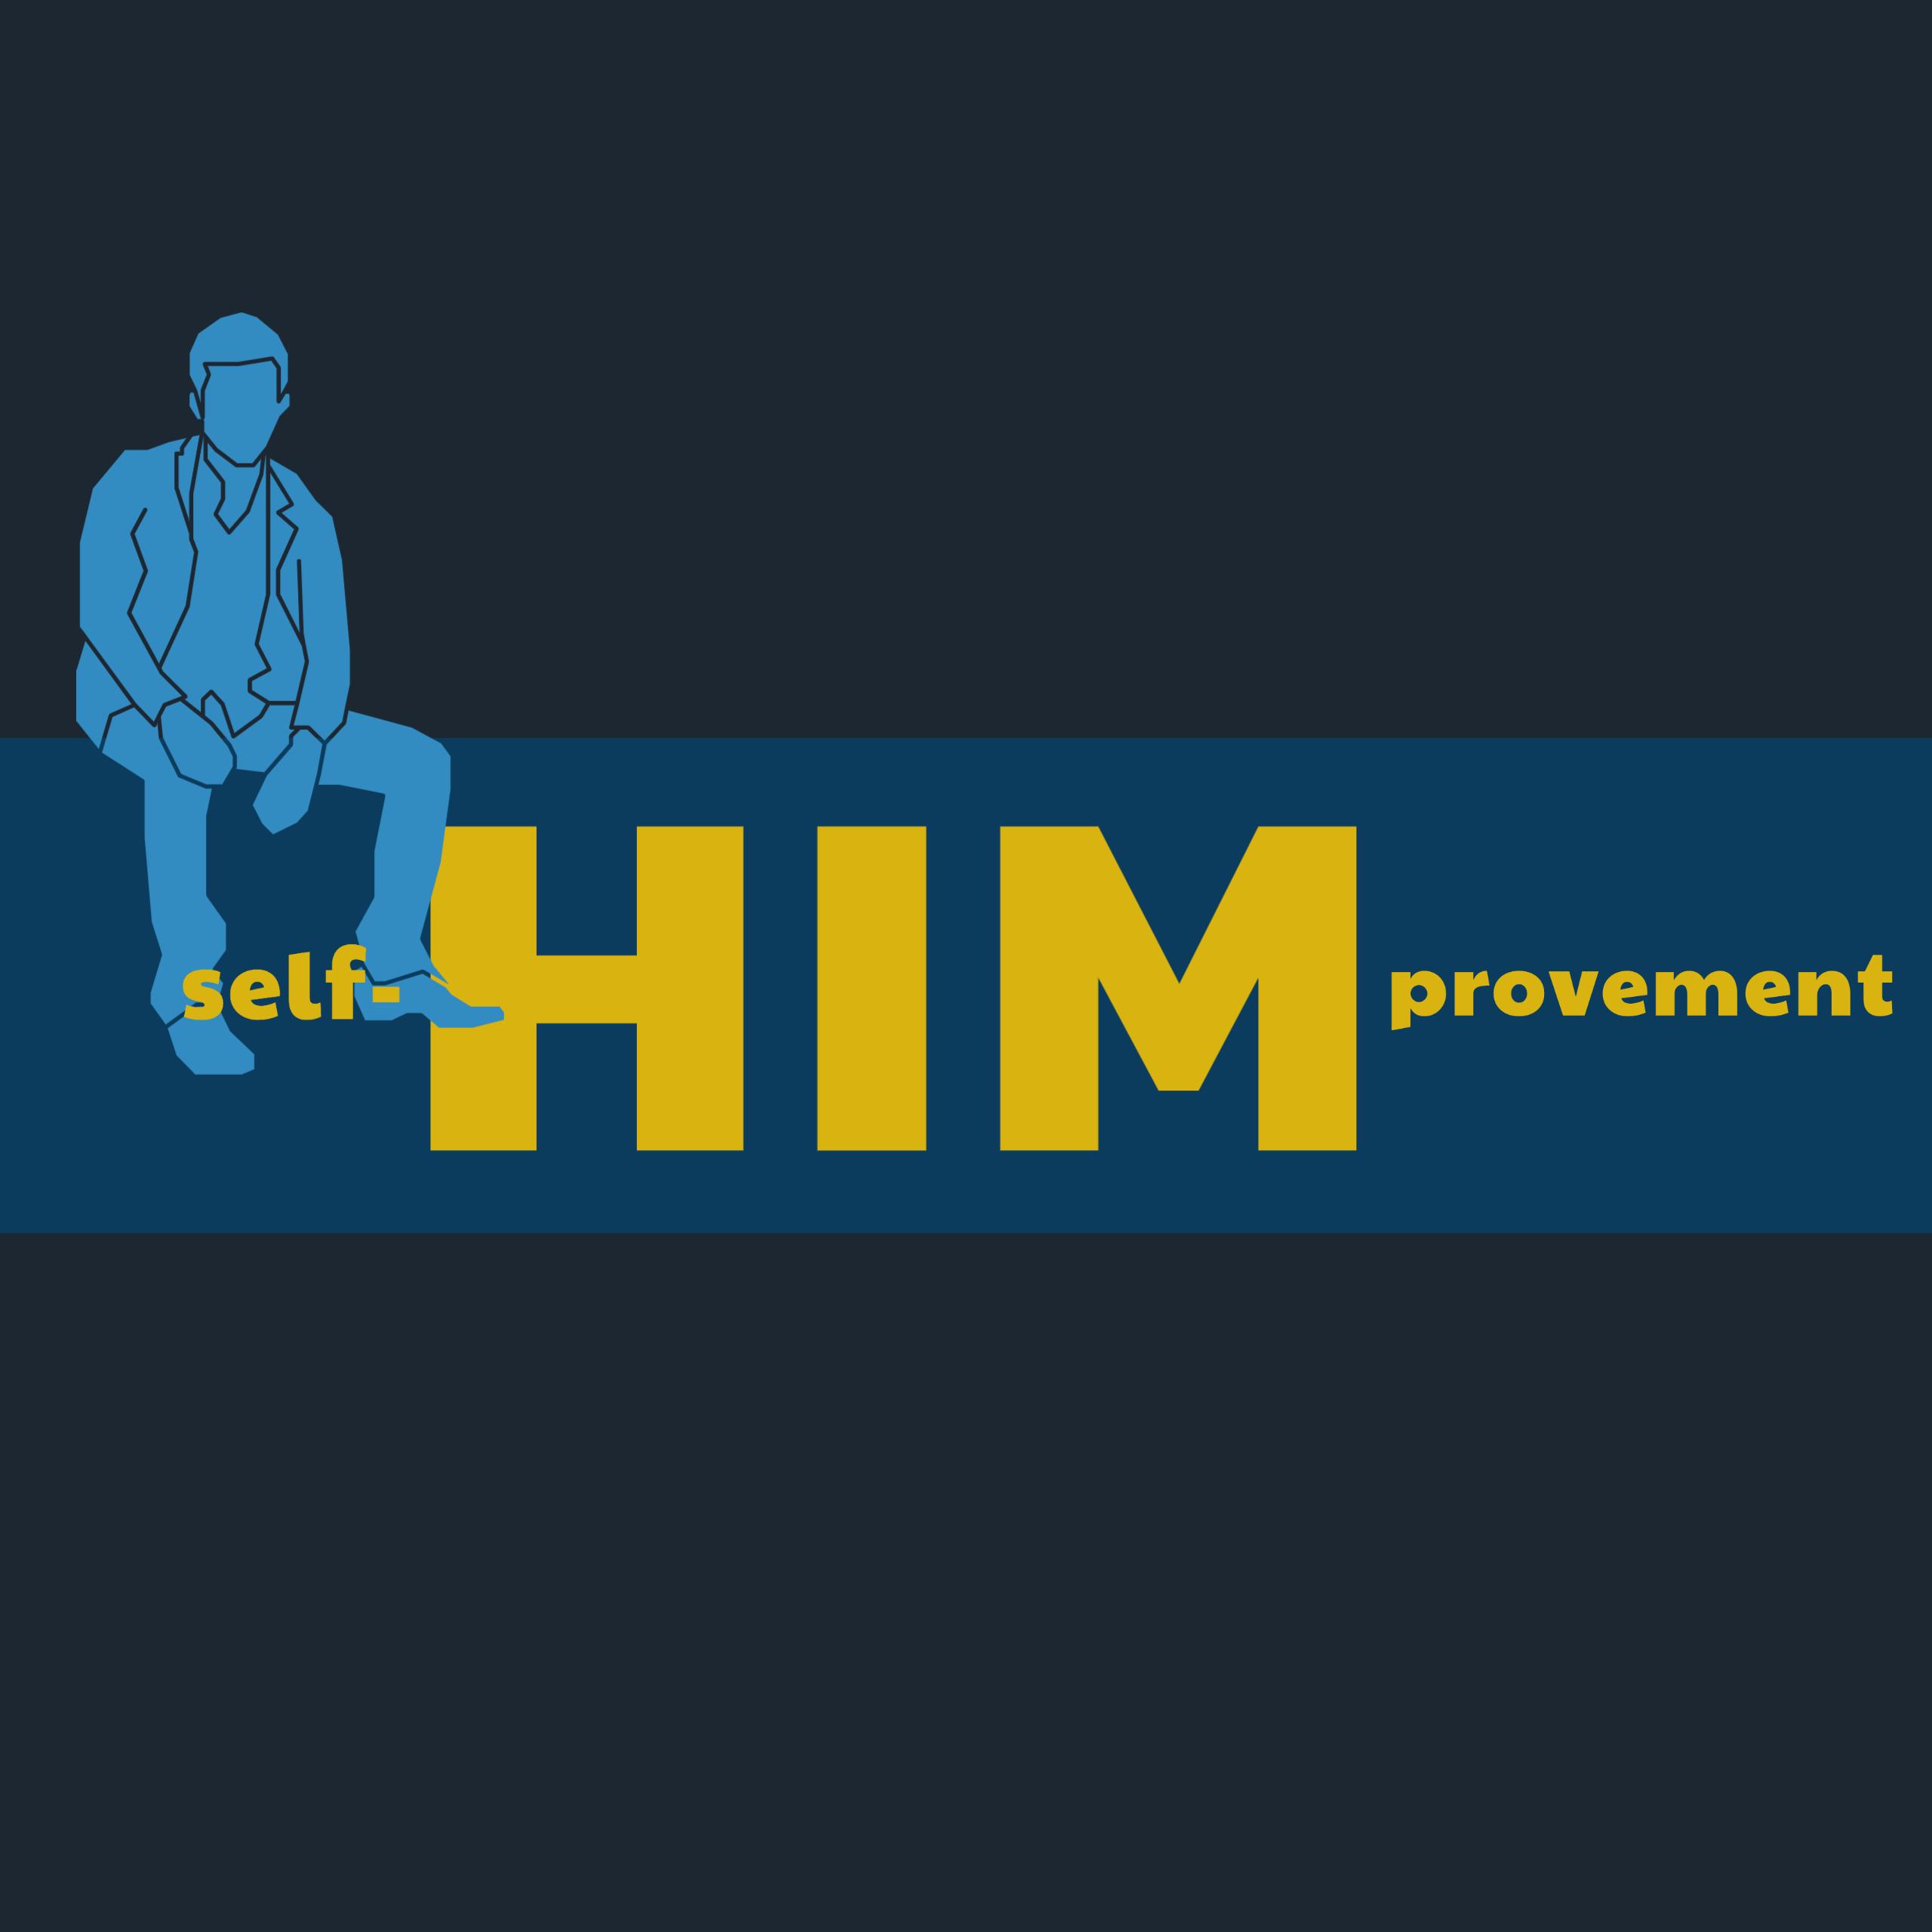 self-himprovement square  logo